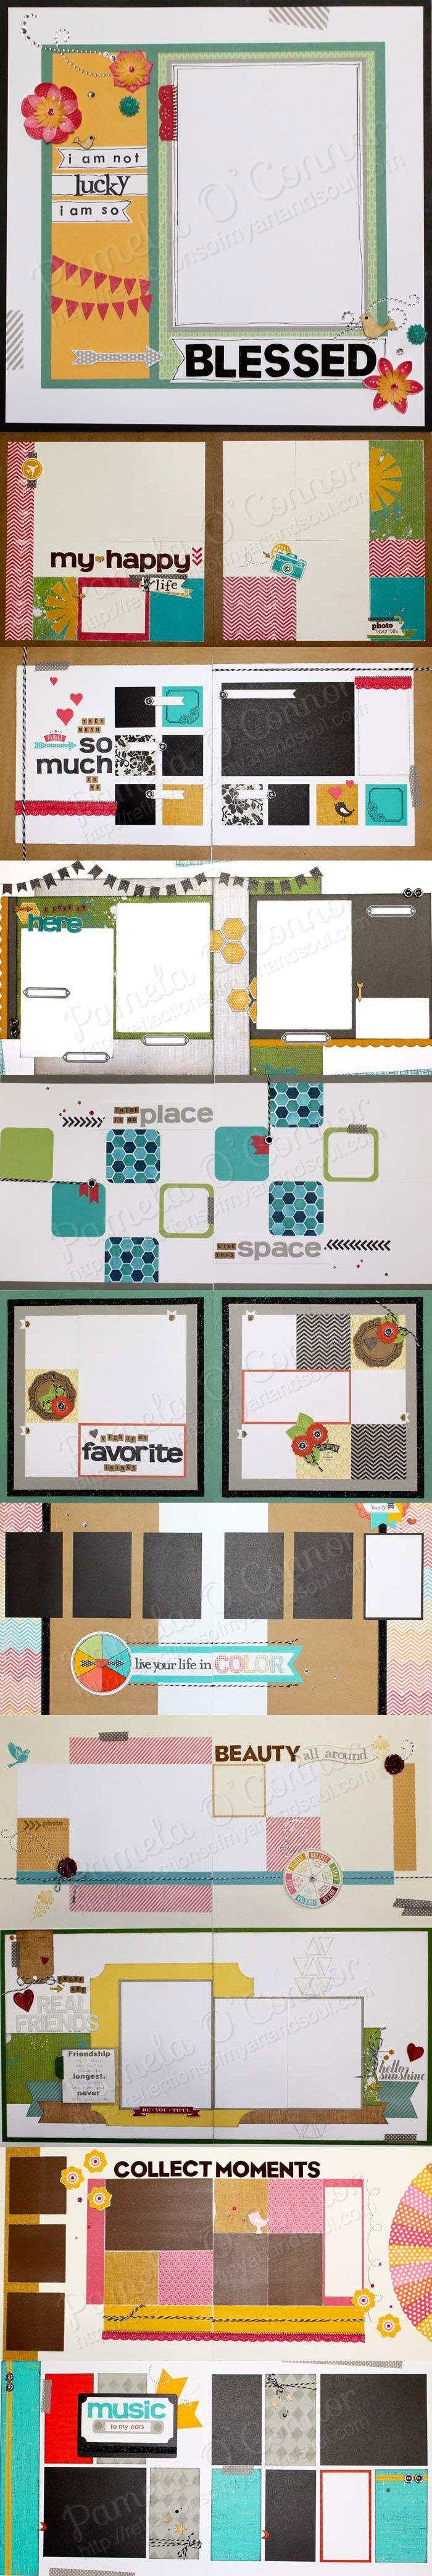 Scrapbook ideas no pictures - Great Easy Scrapbook Ideas